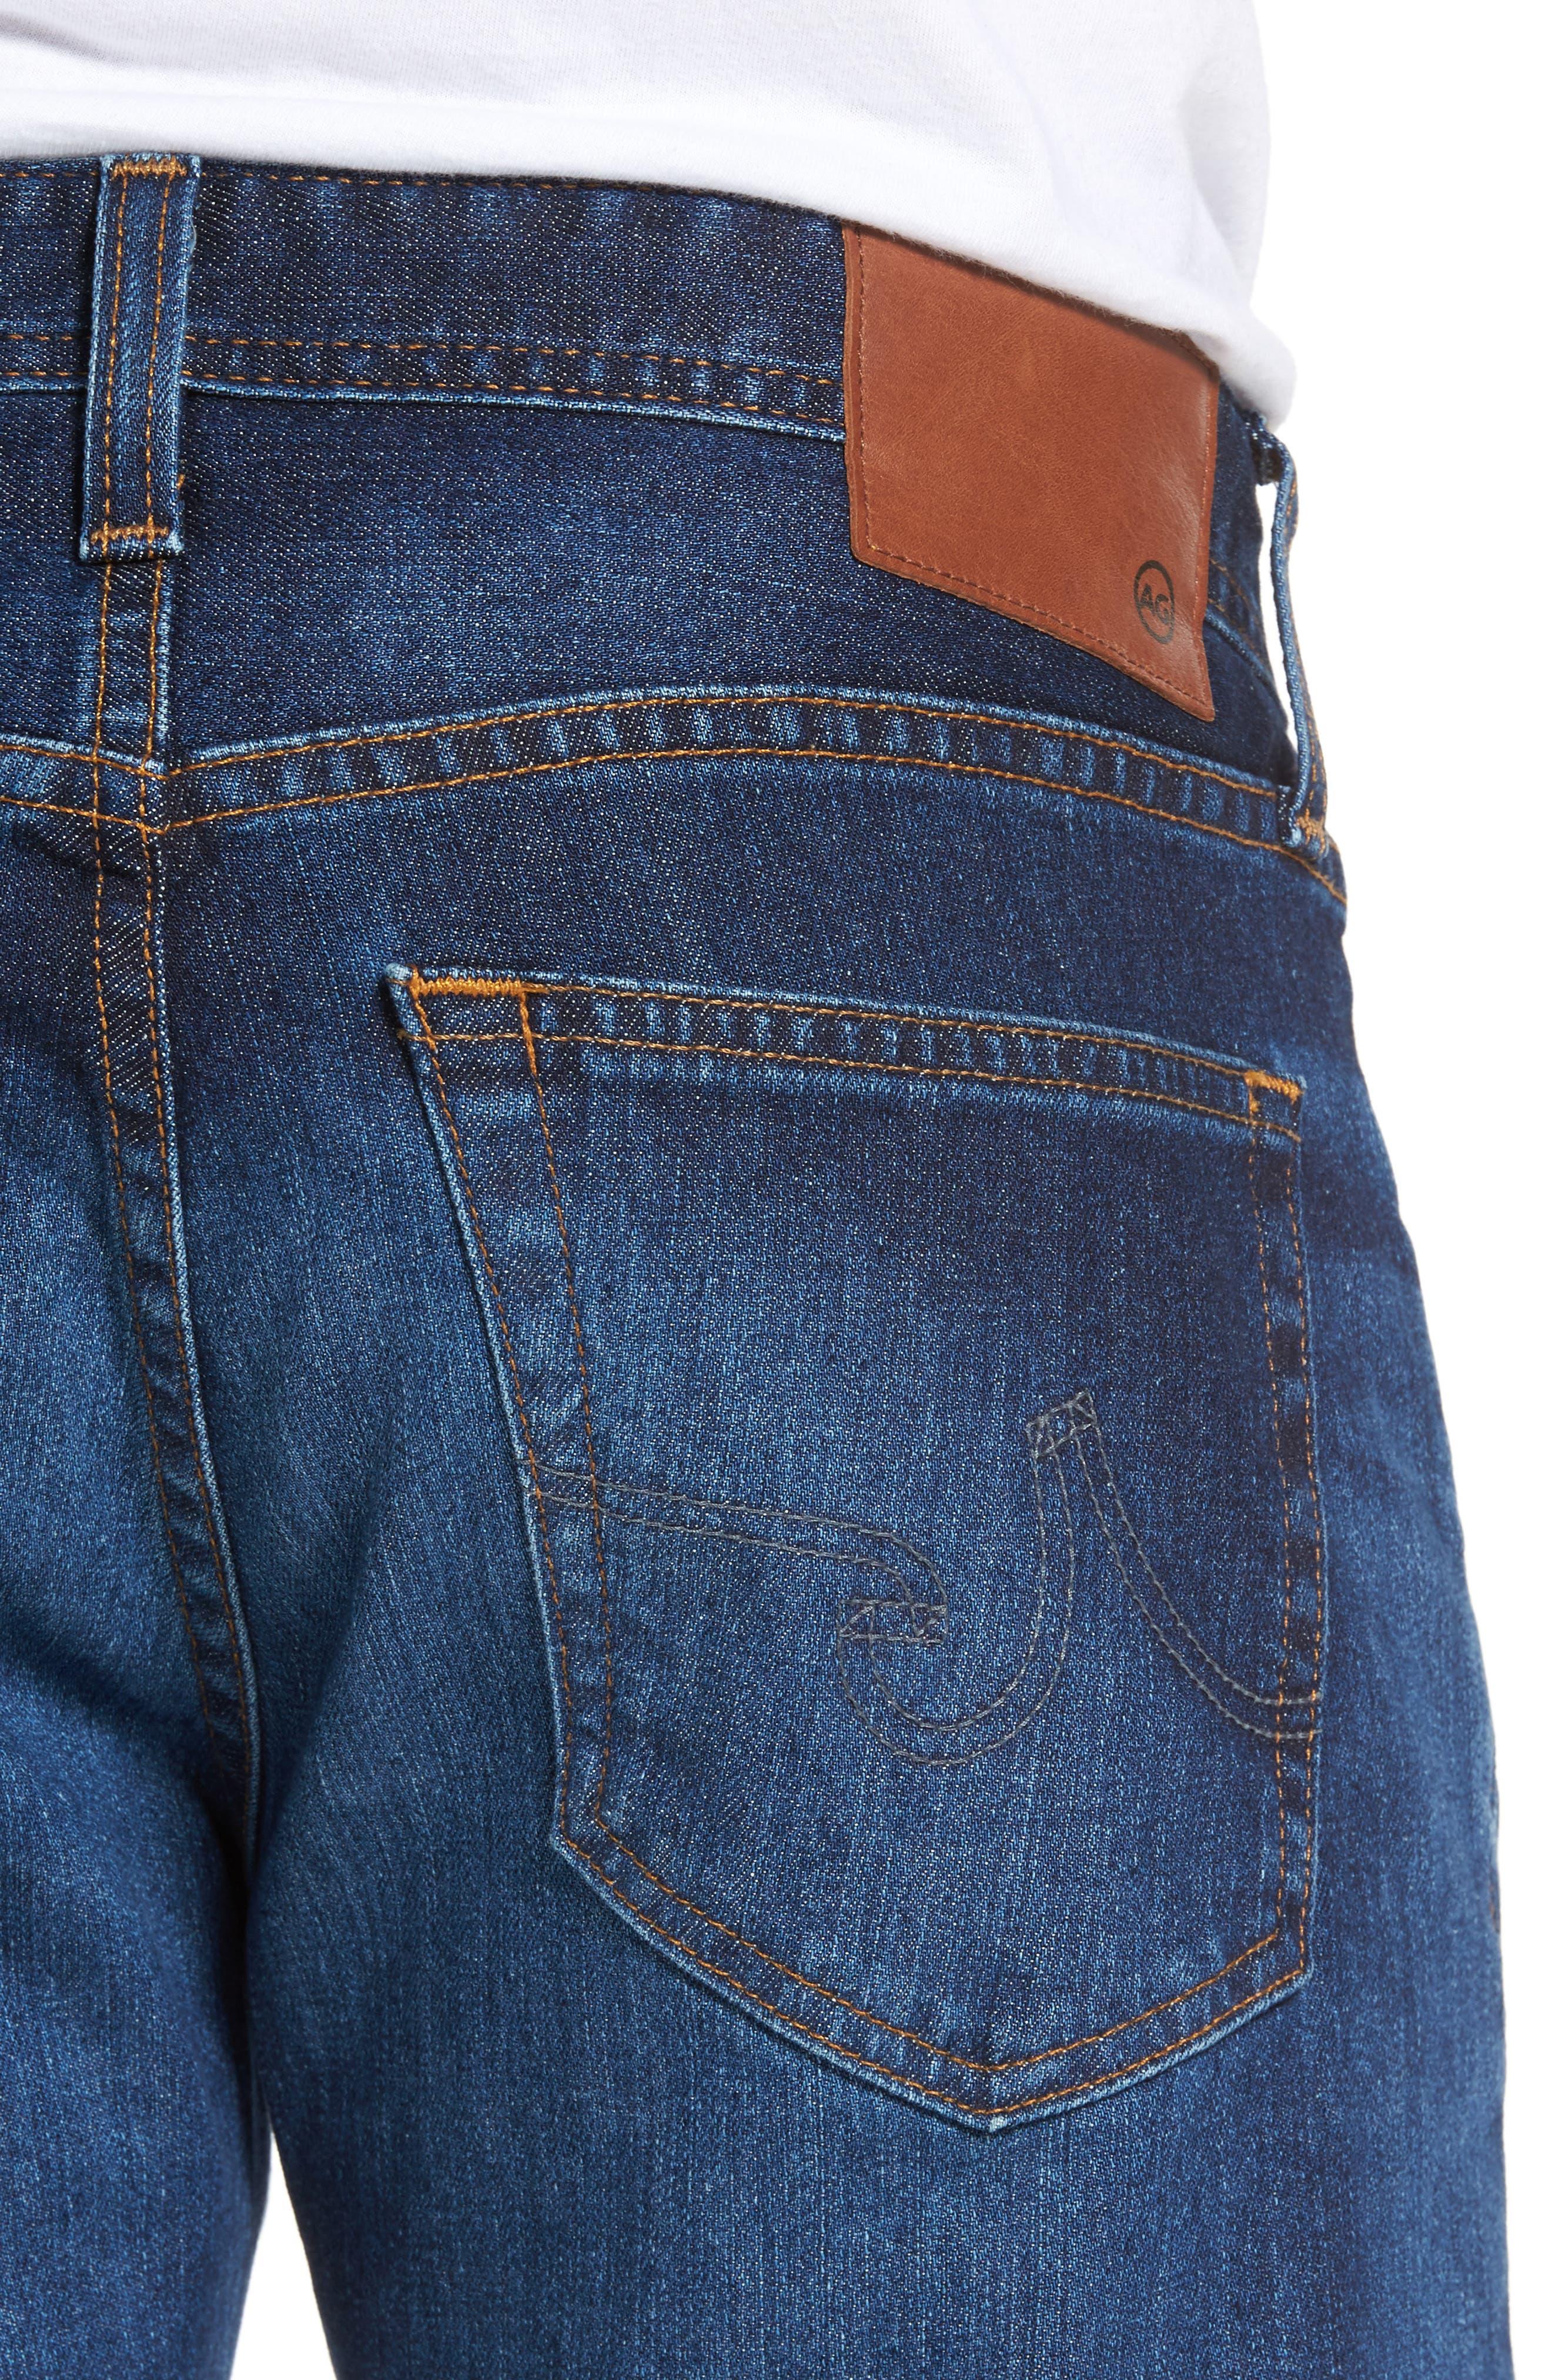 Tellis Slim Fit Jeans,                             Alternate thumbnail 4, color,                             451